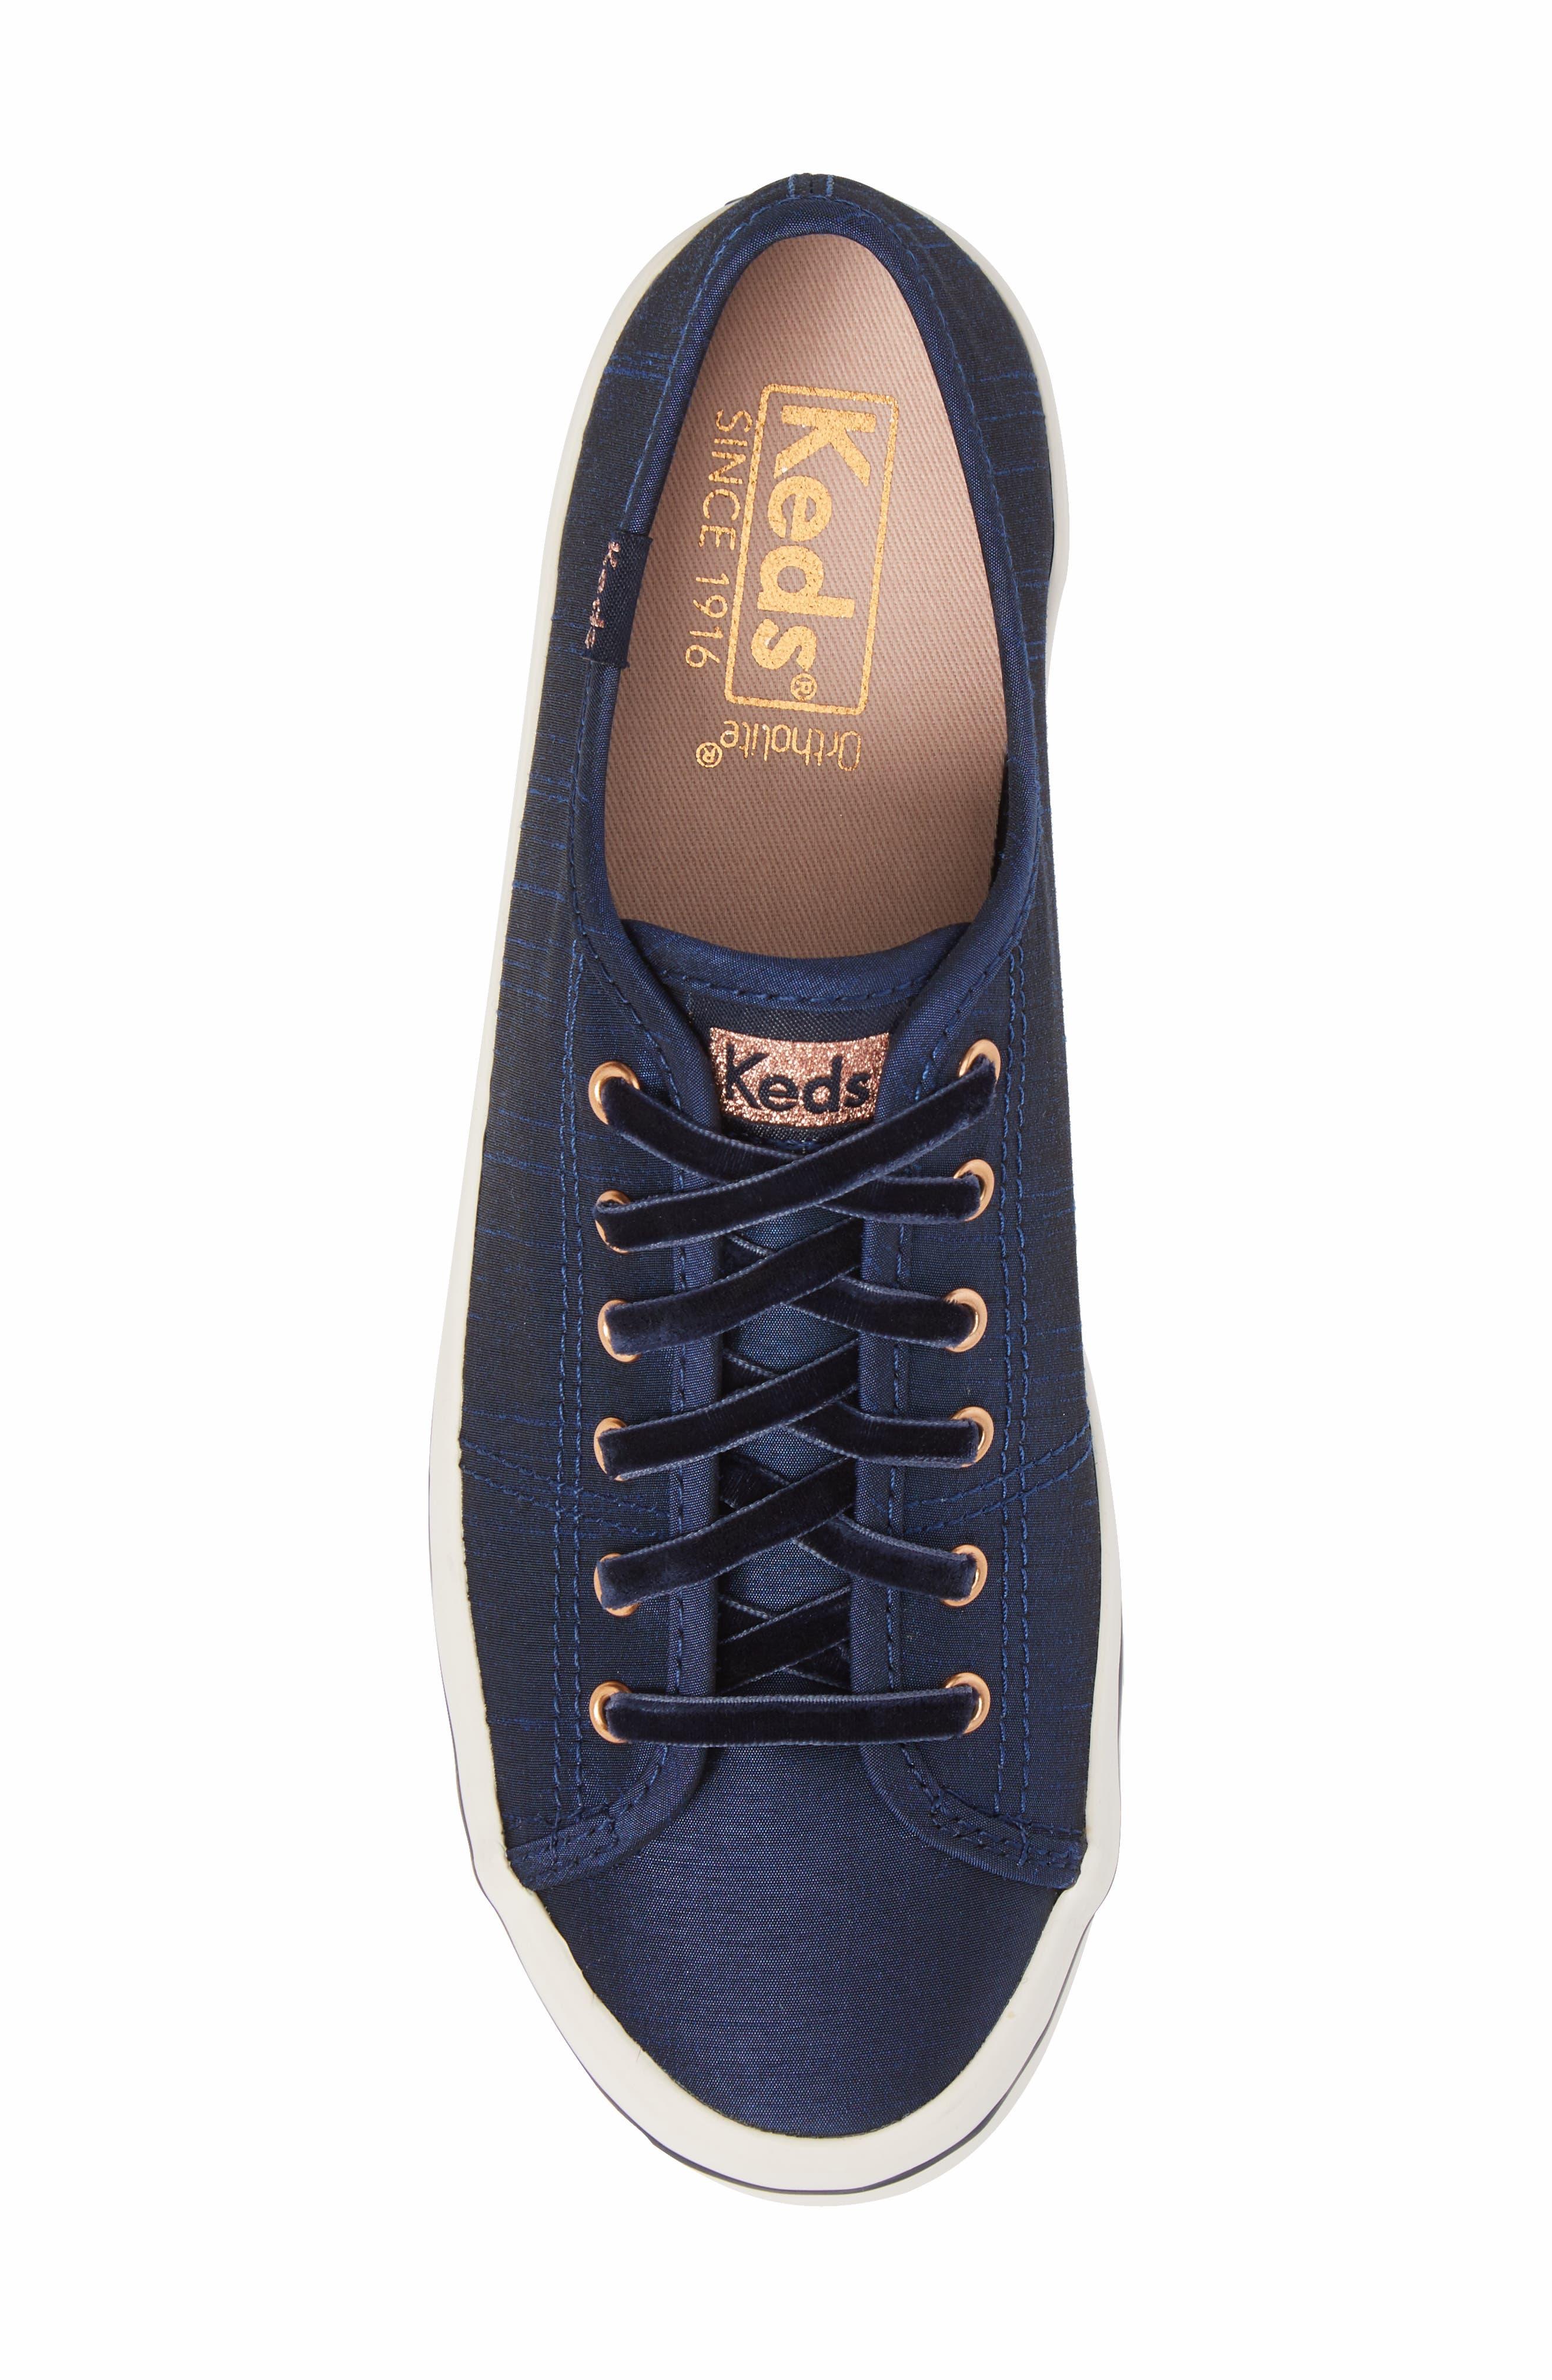 Kickstart Sneaker,                             Alternate thumbnail 5, color,                             Navy Satin